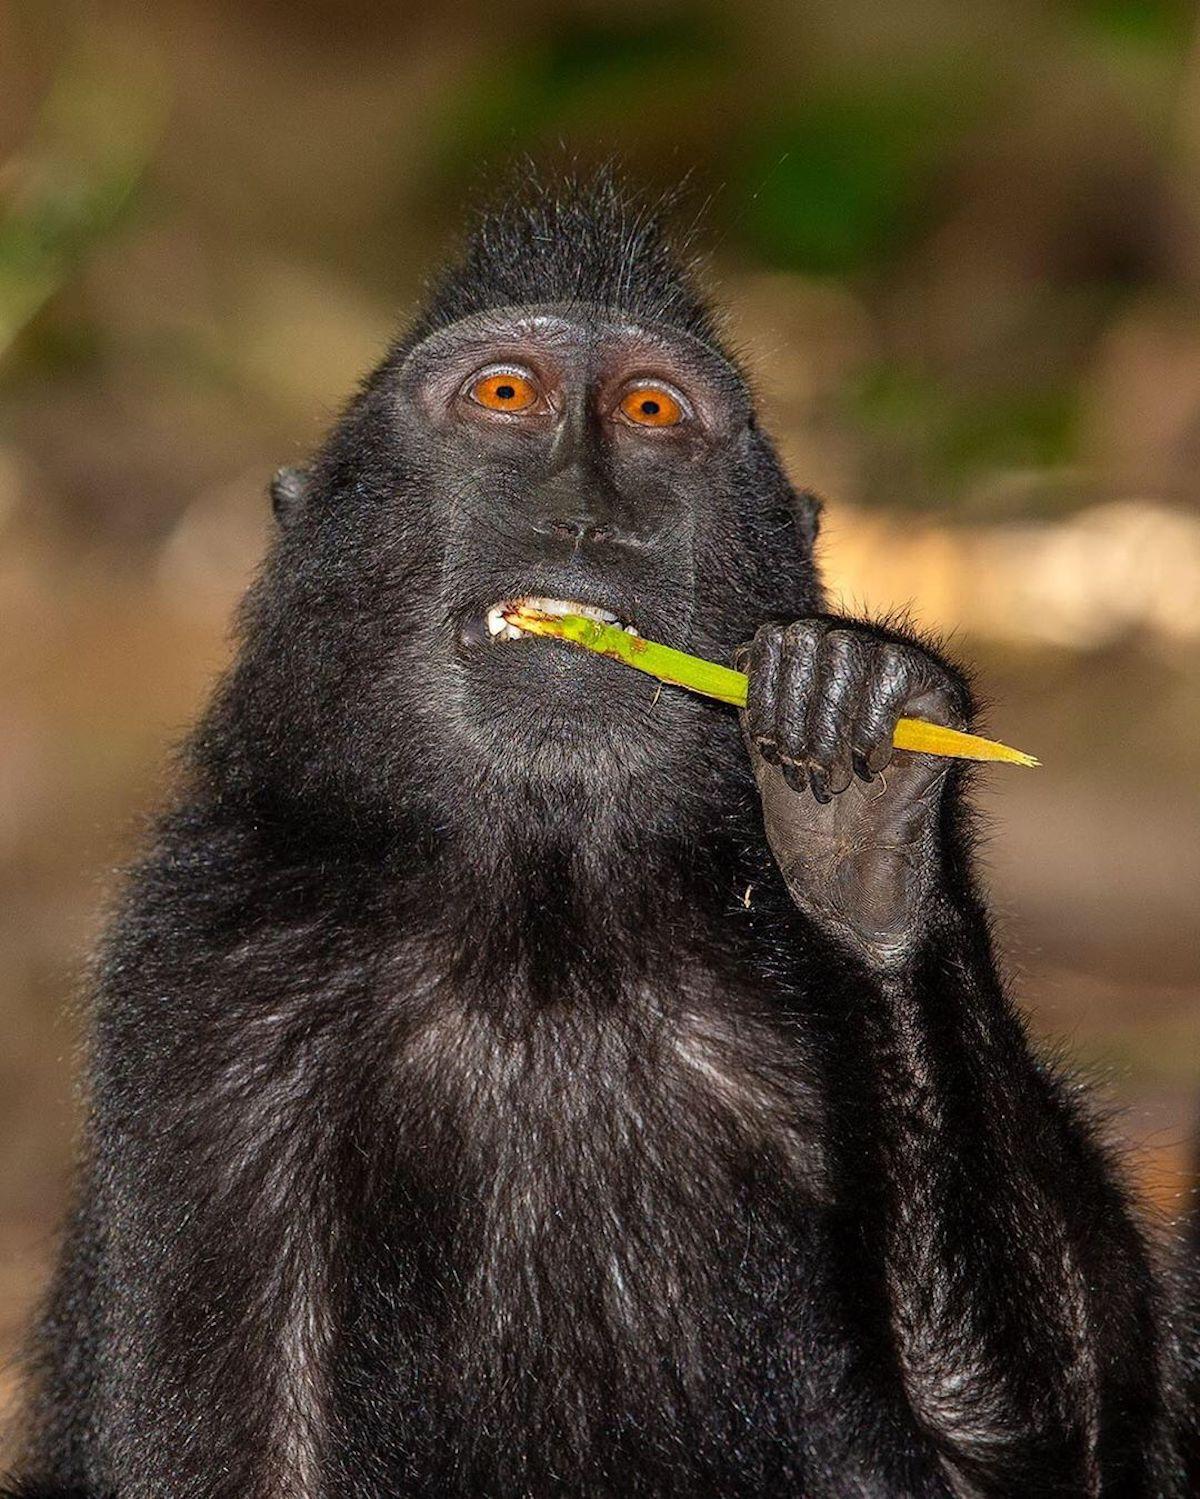 Photos of Monkeys by Mogens Trolle